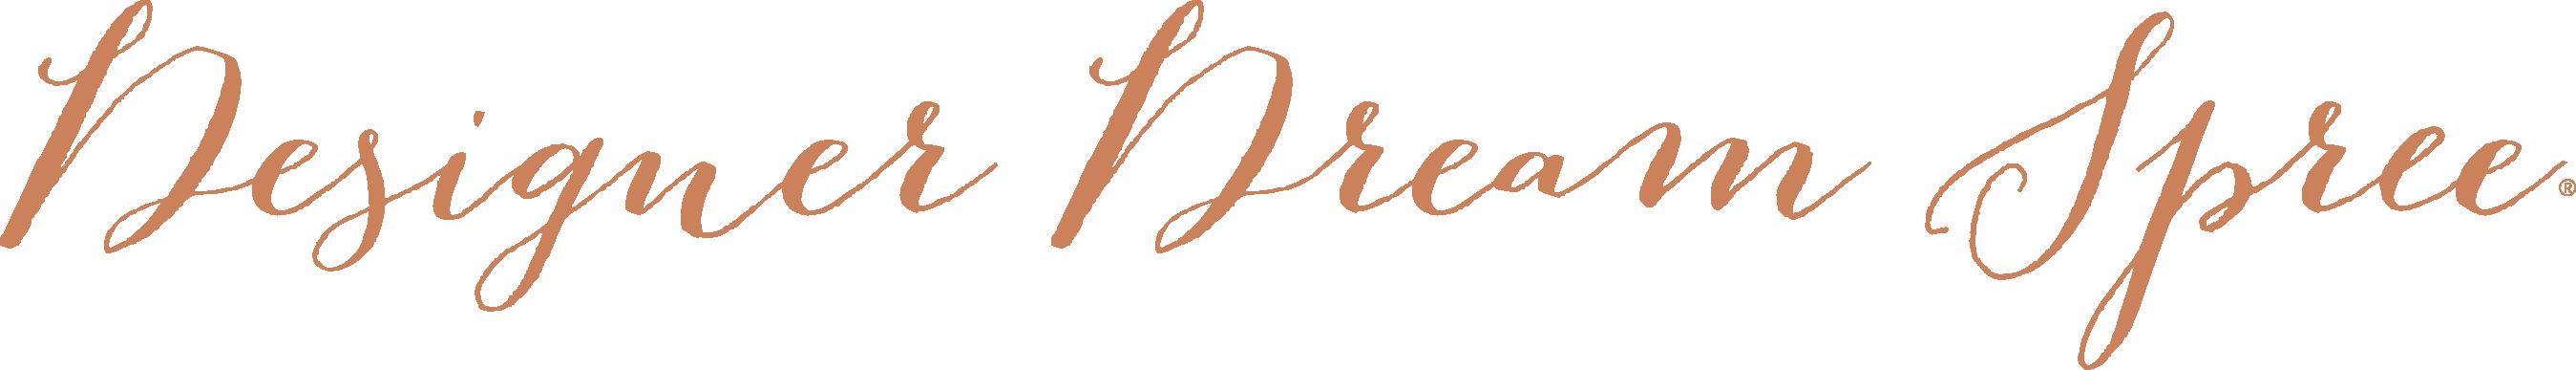 Designer Dream Spree Logo